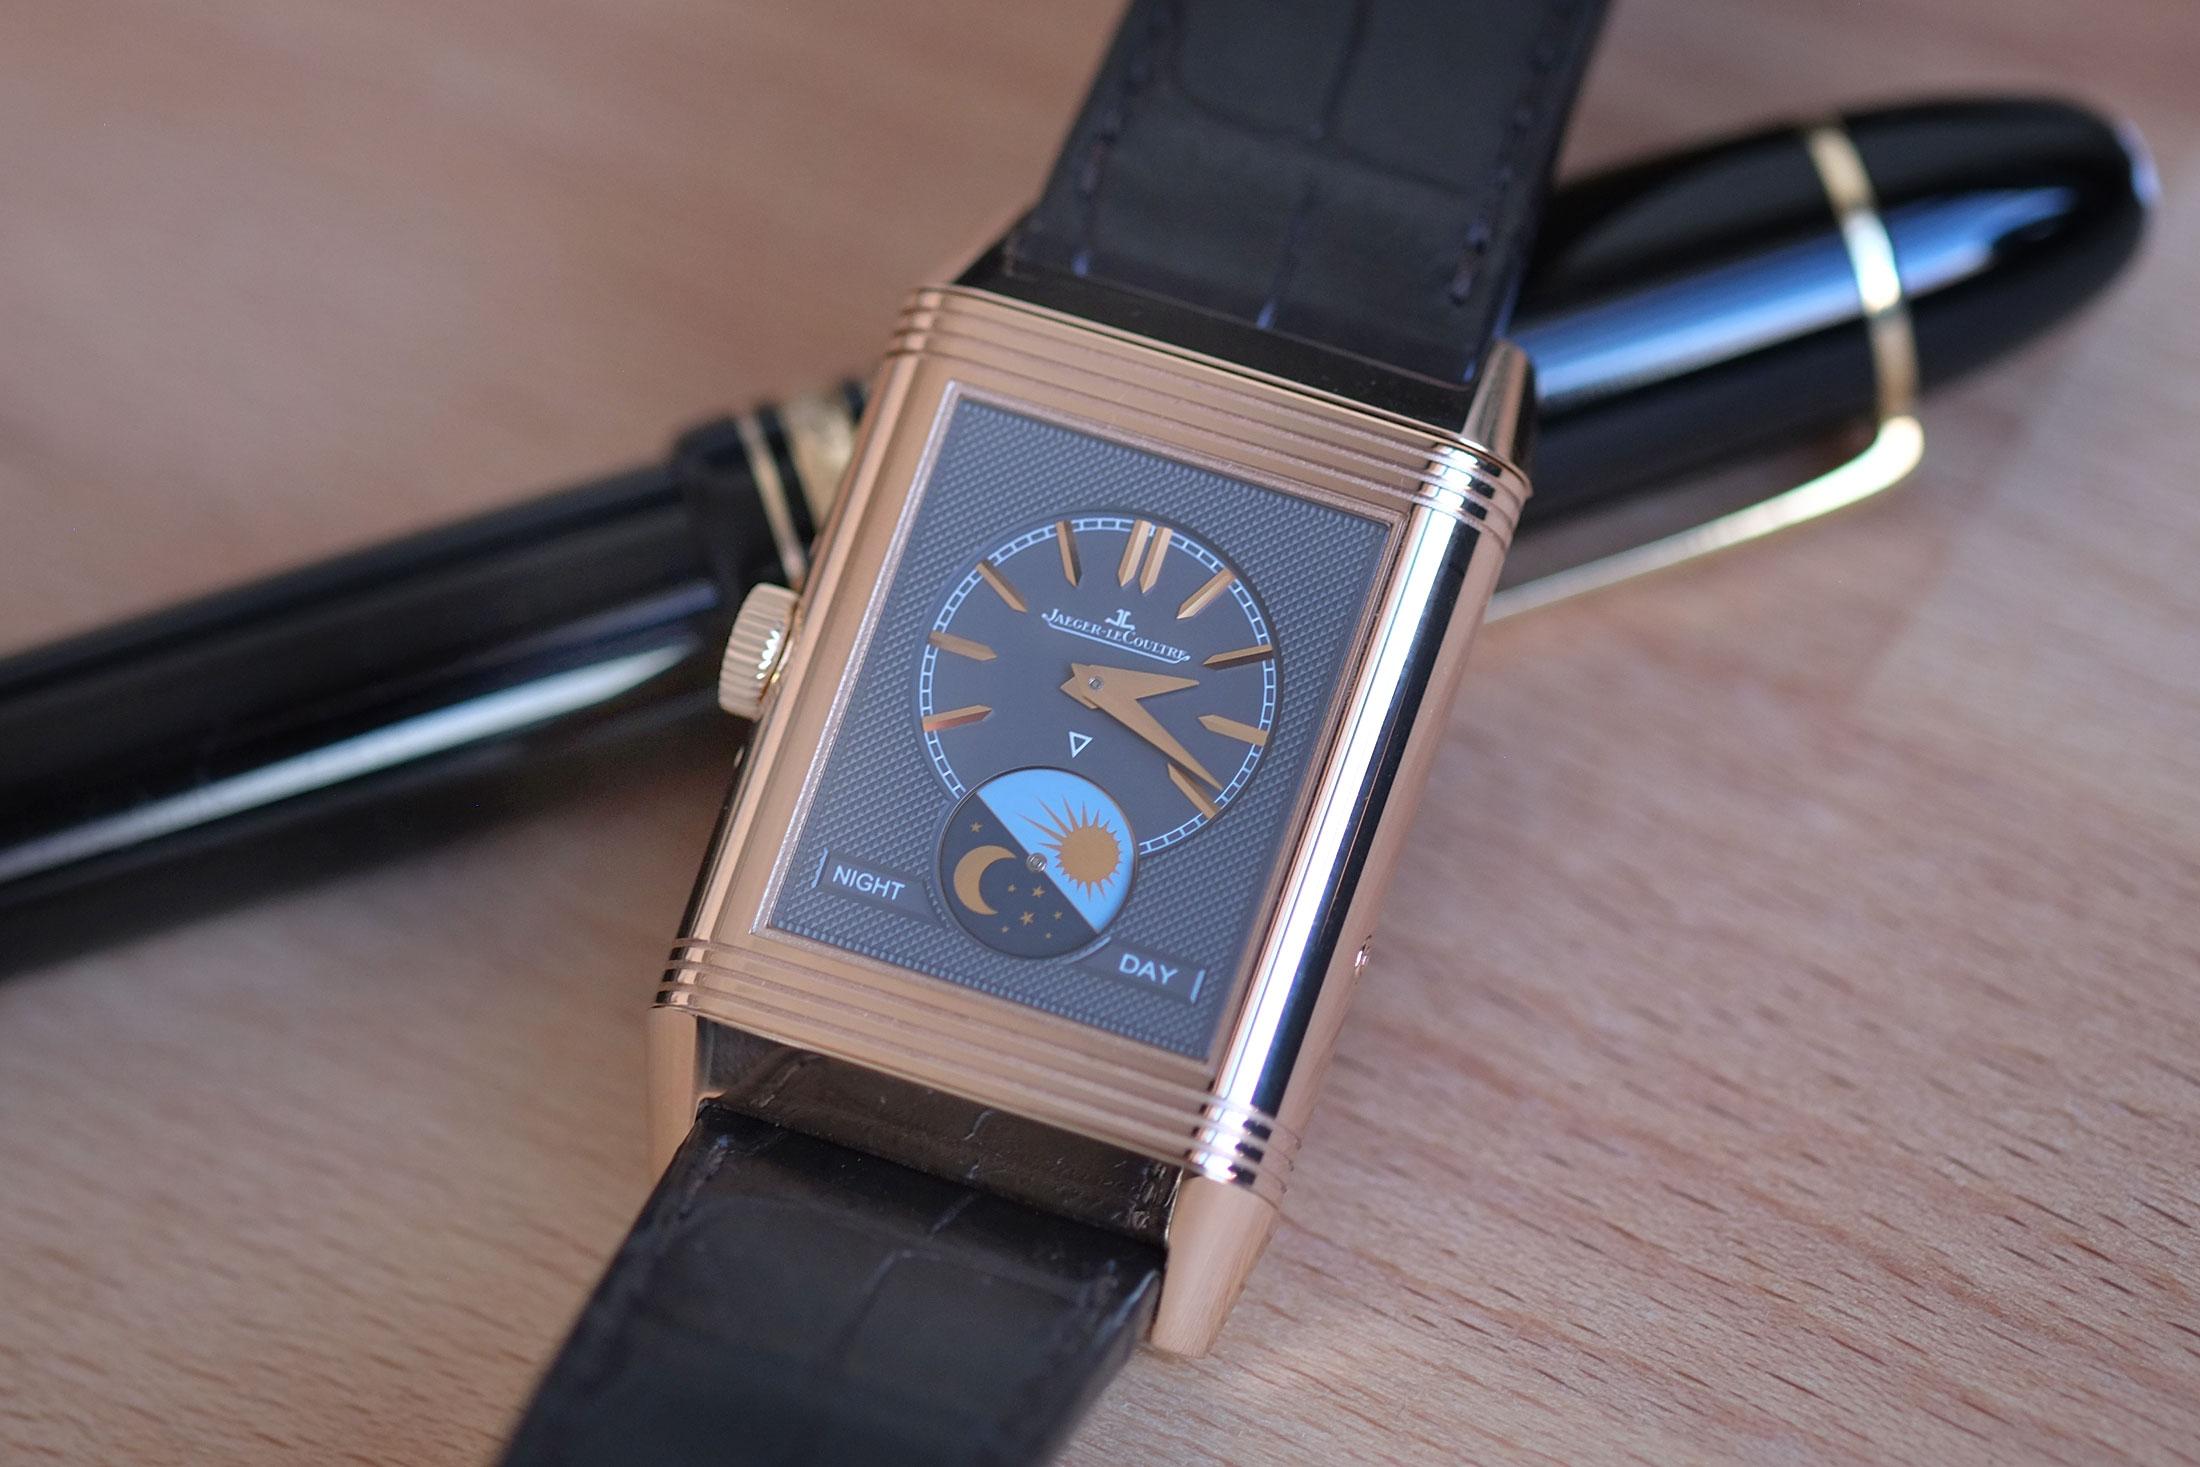 64d03b1e09e A week on the wrist the jaeger lecoultre reverso tribute calendar jpg  820x547 Jaeger lecoultre reverso